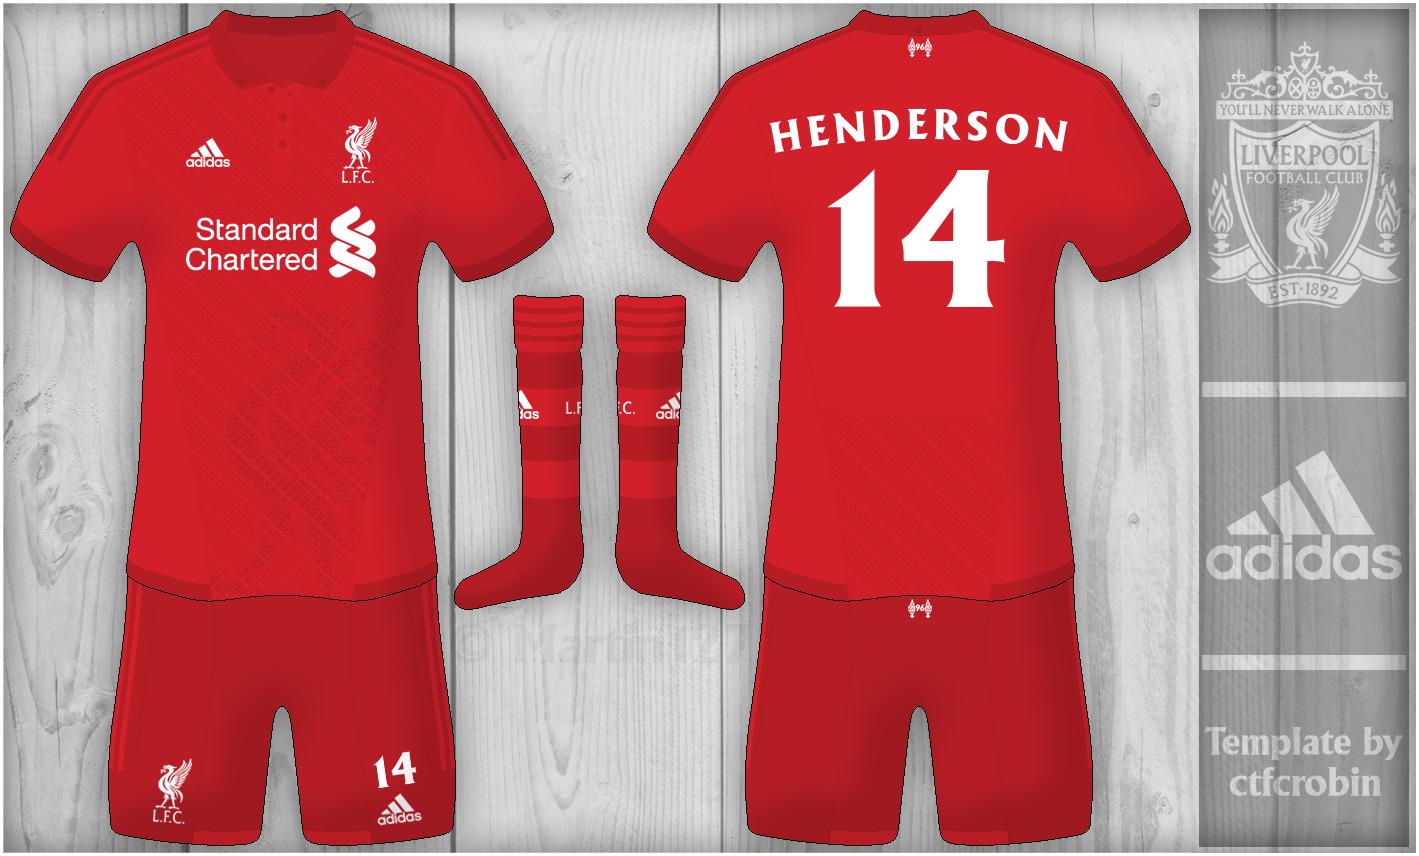 super popular 8f25e 1c1eb Liverpool Home - Adidas Kit